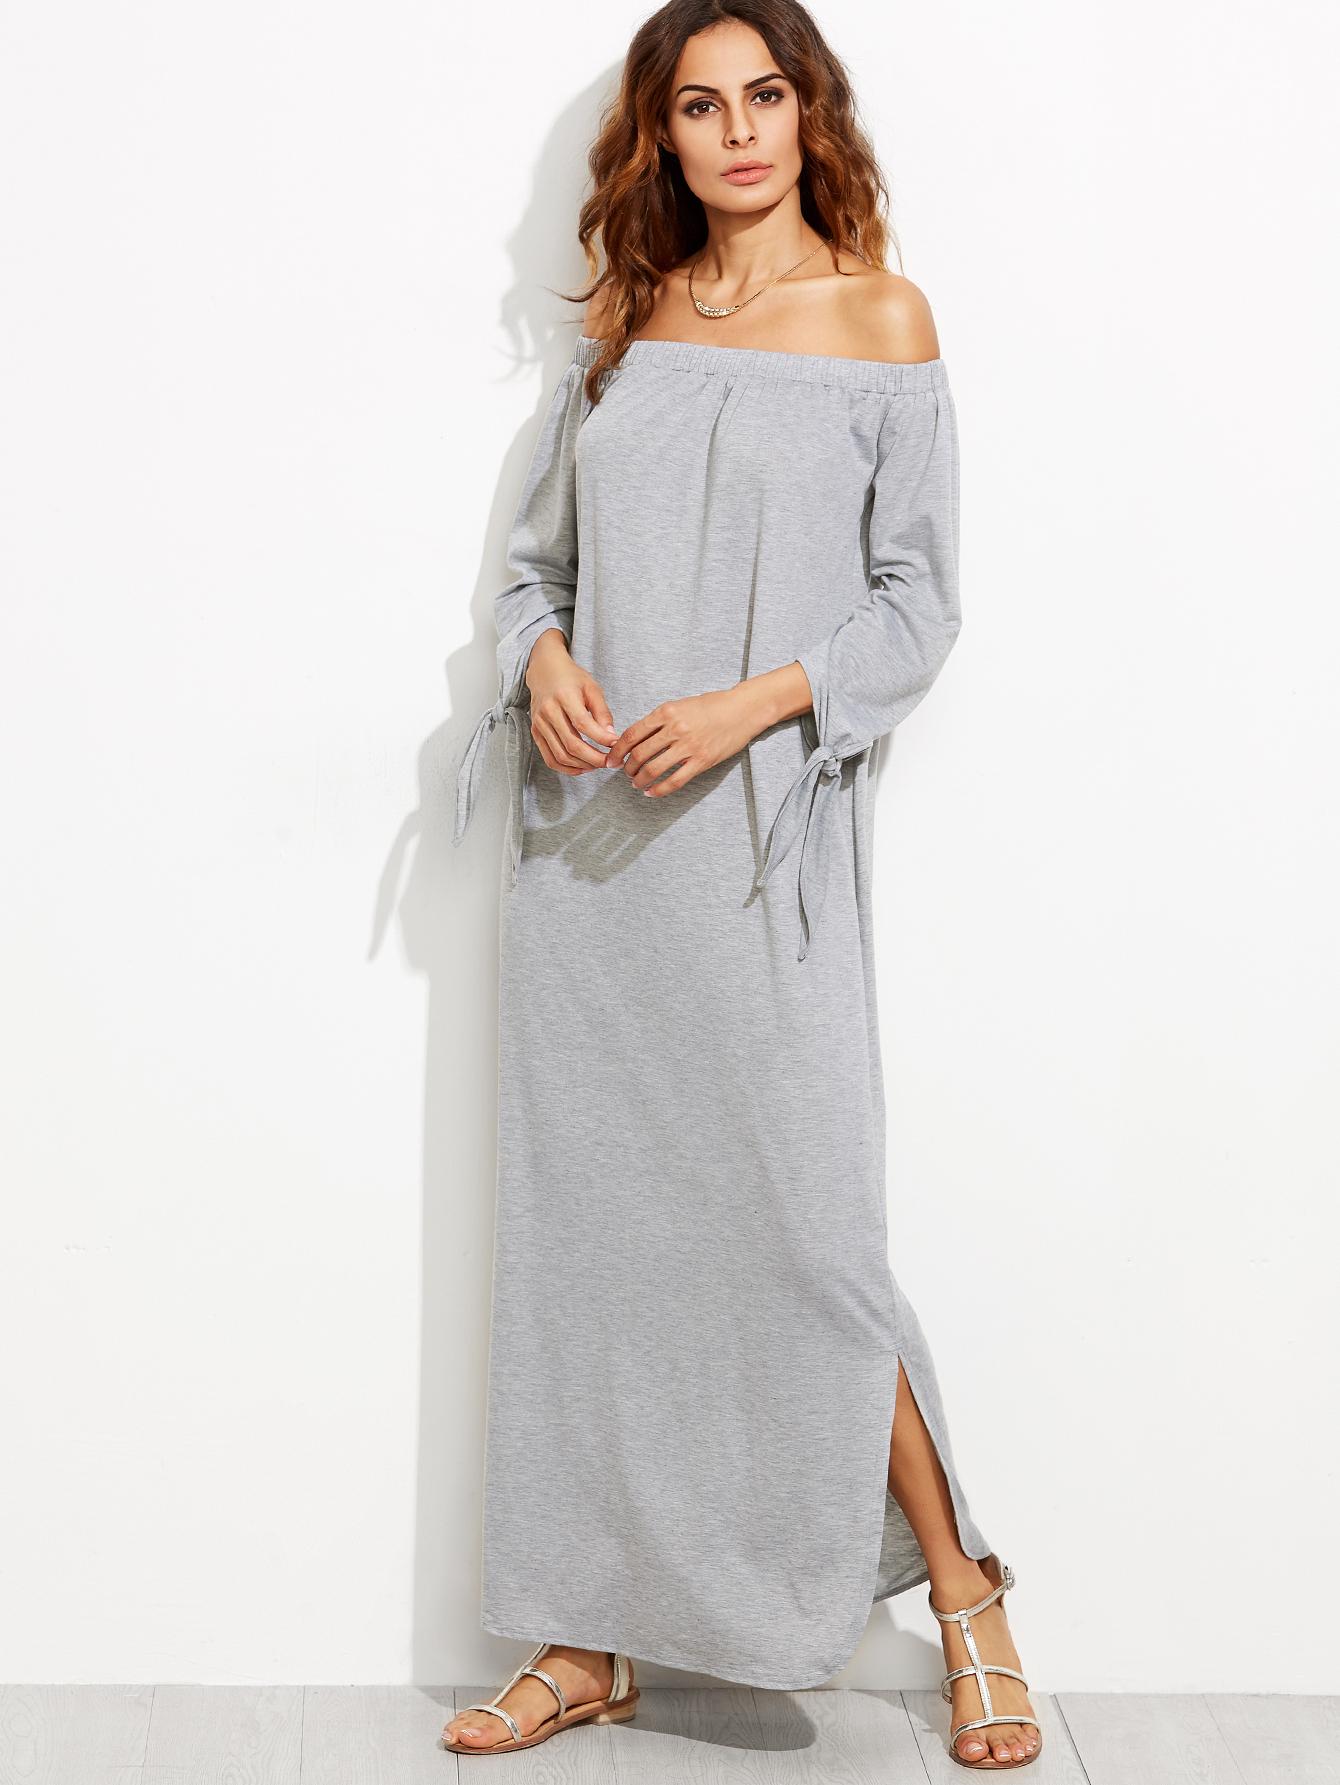 0fe73cdedfed Heather Grey Off The Shoulder Tie Sleeve Slit Maxi Dress — 0.00 € color   Grey